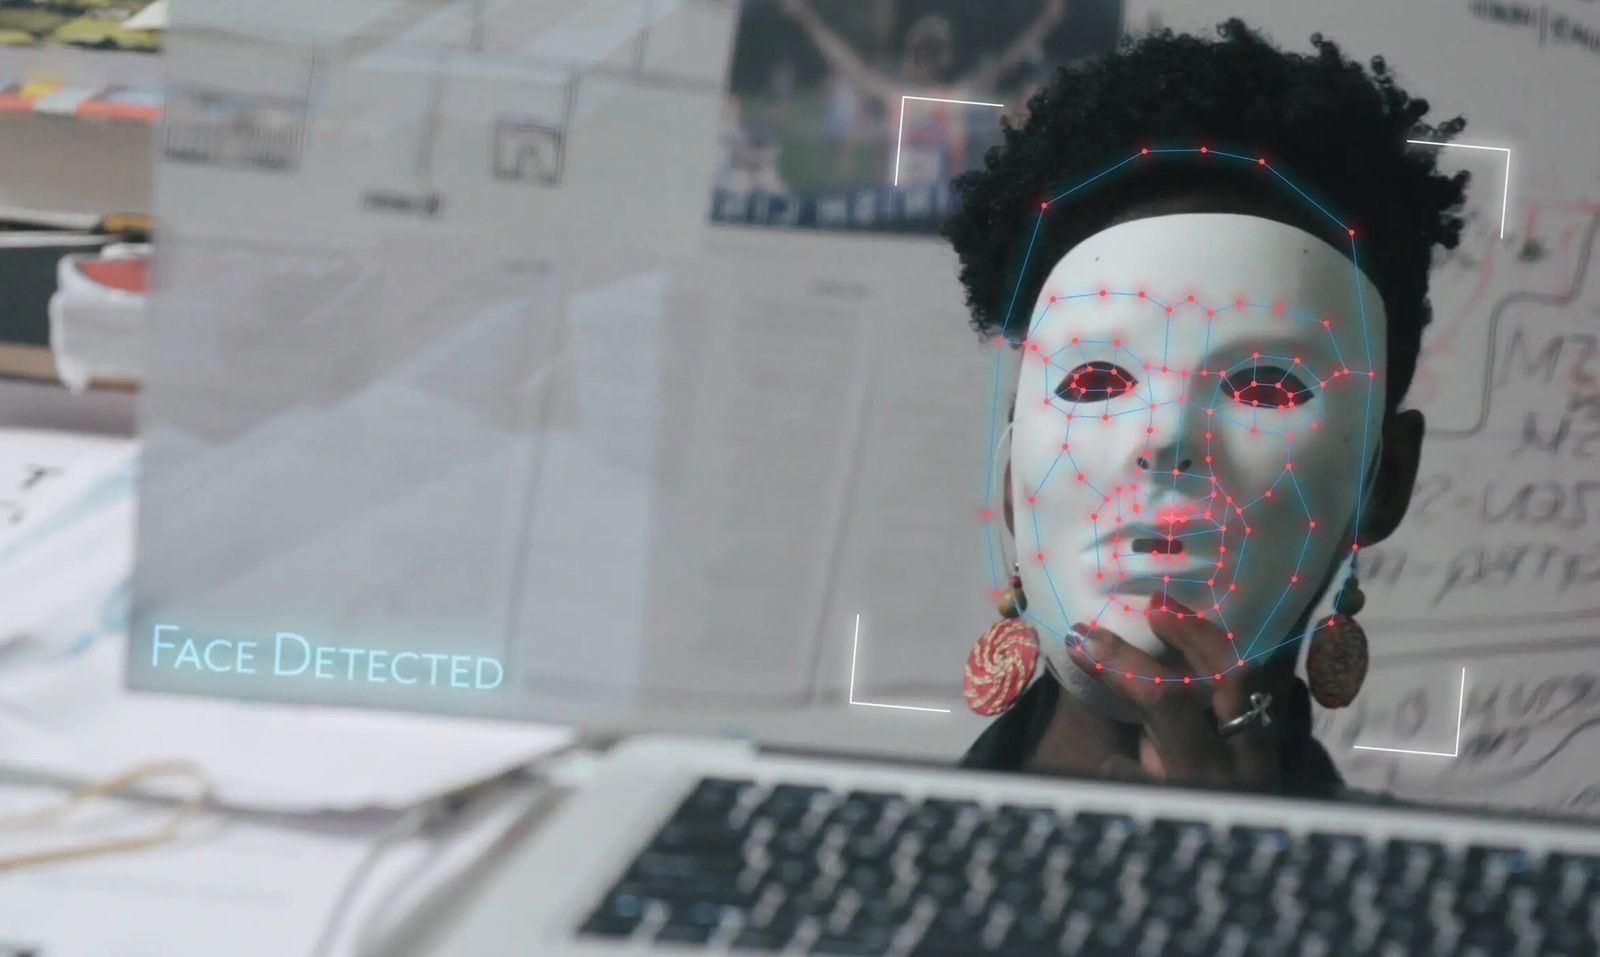 CODED BIAS, computer scientist and digital activist Joy Buolamwini...